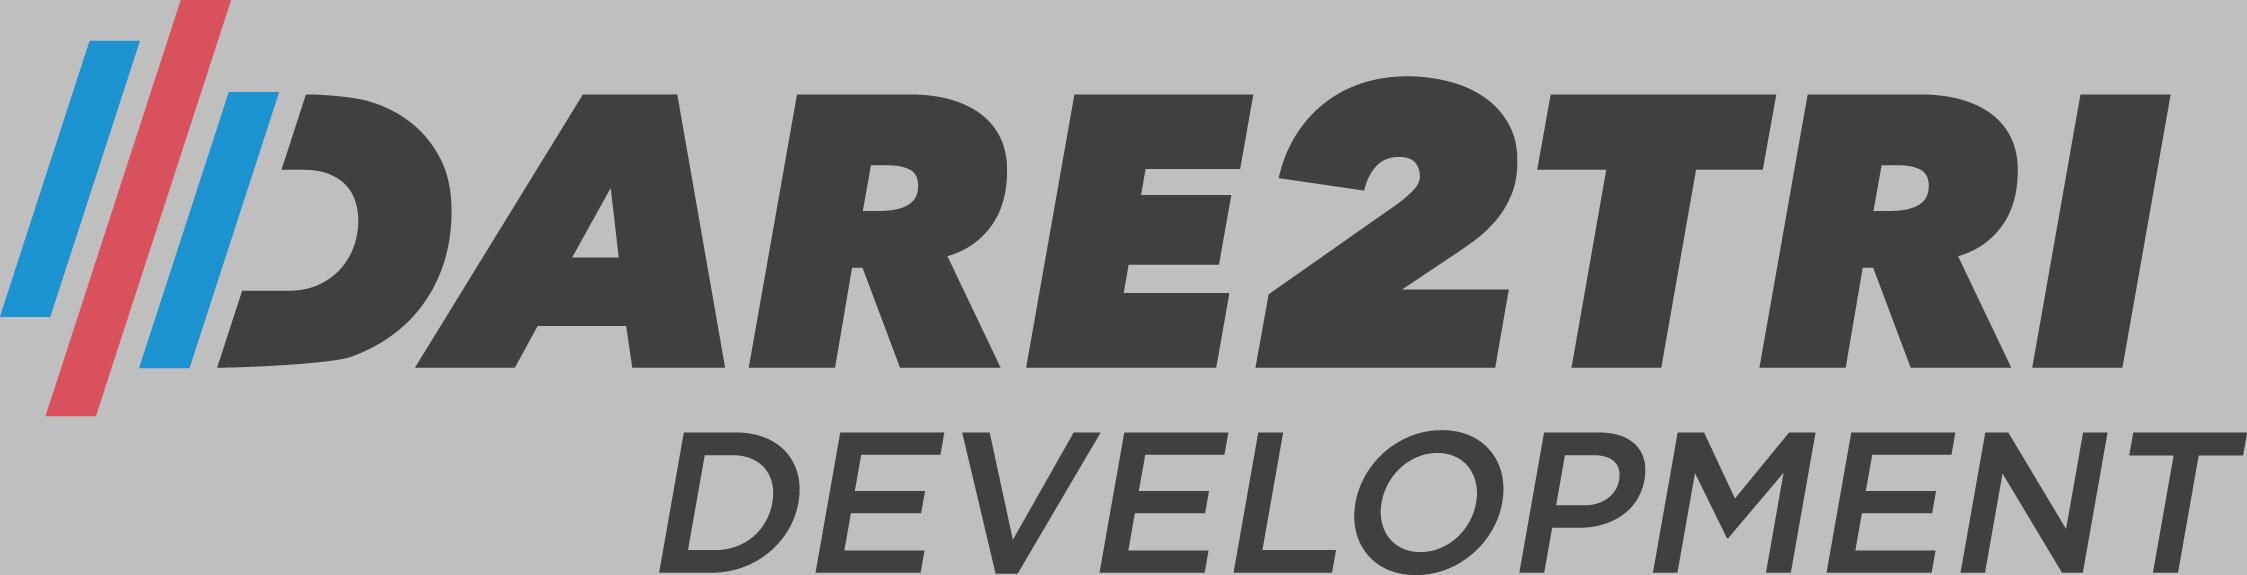 Development-Team-logo.jpg